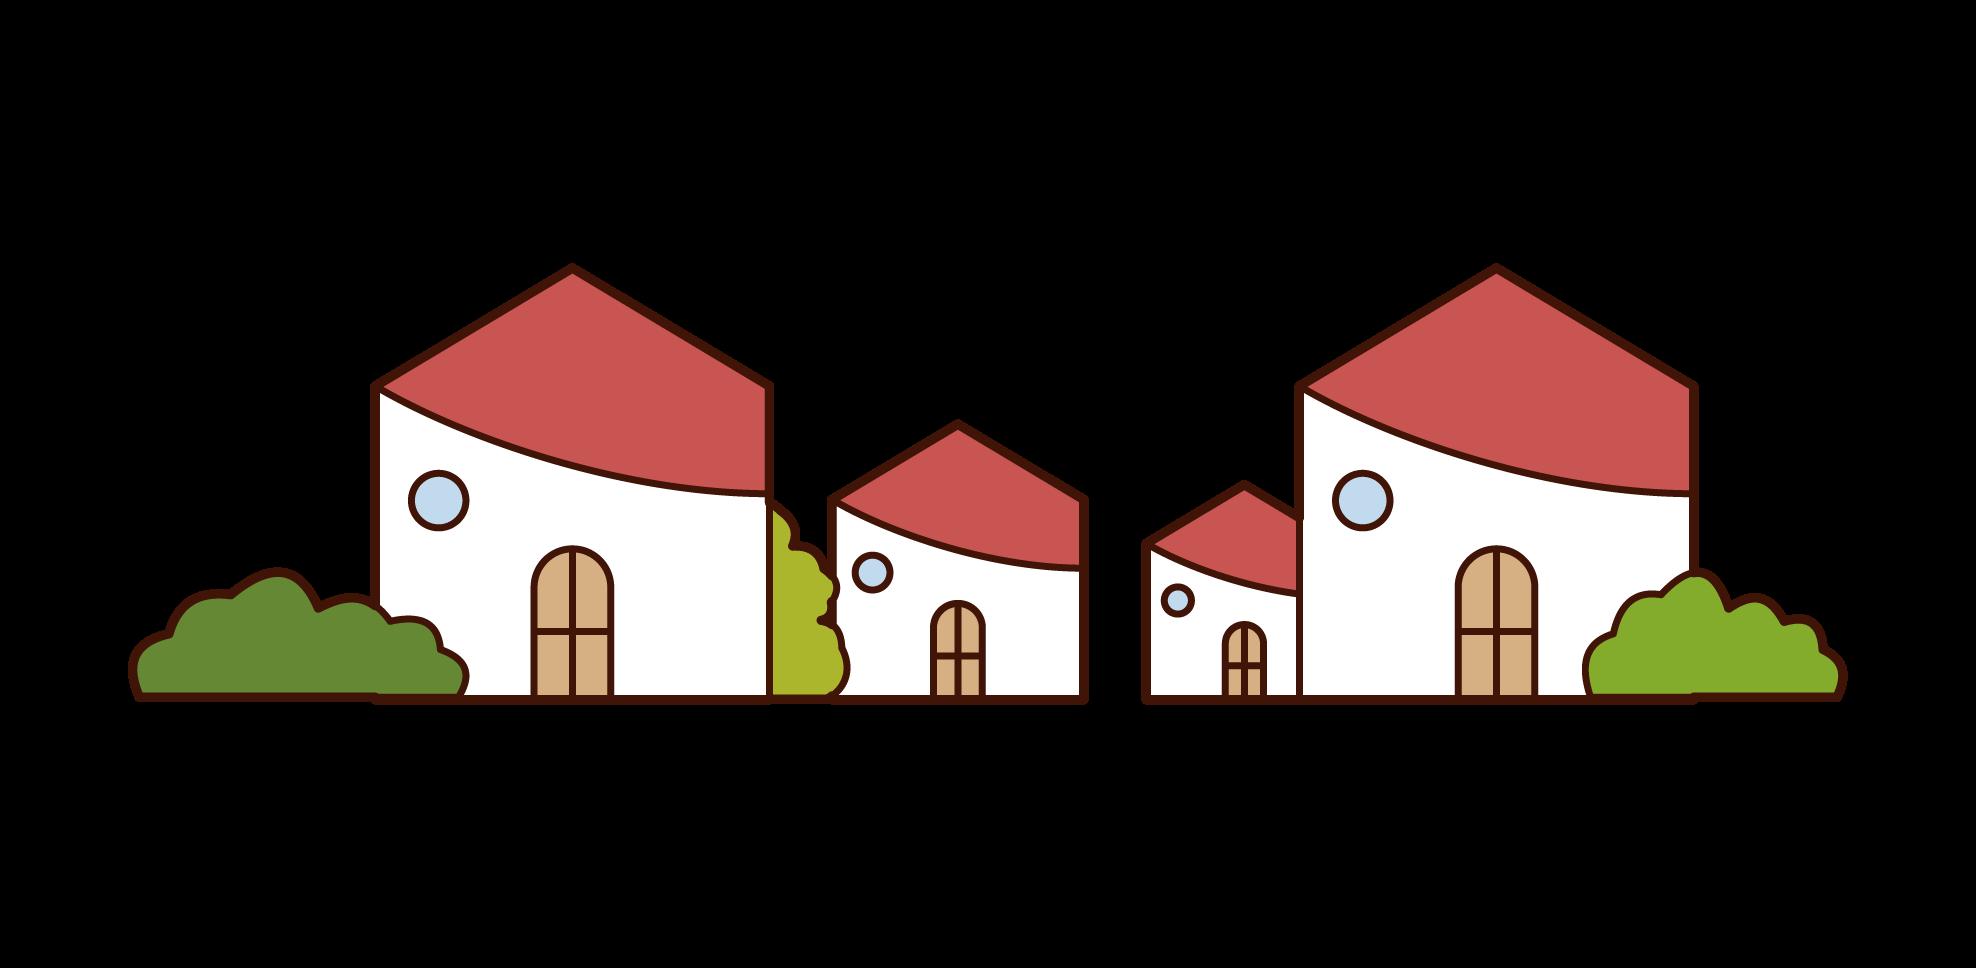 Illustration of KuKuKeKe House